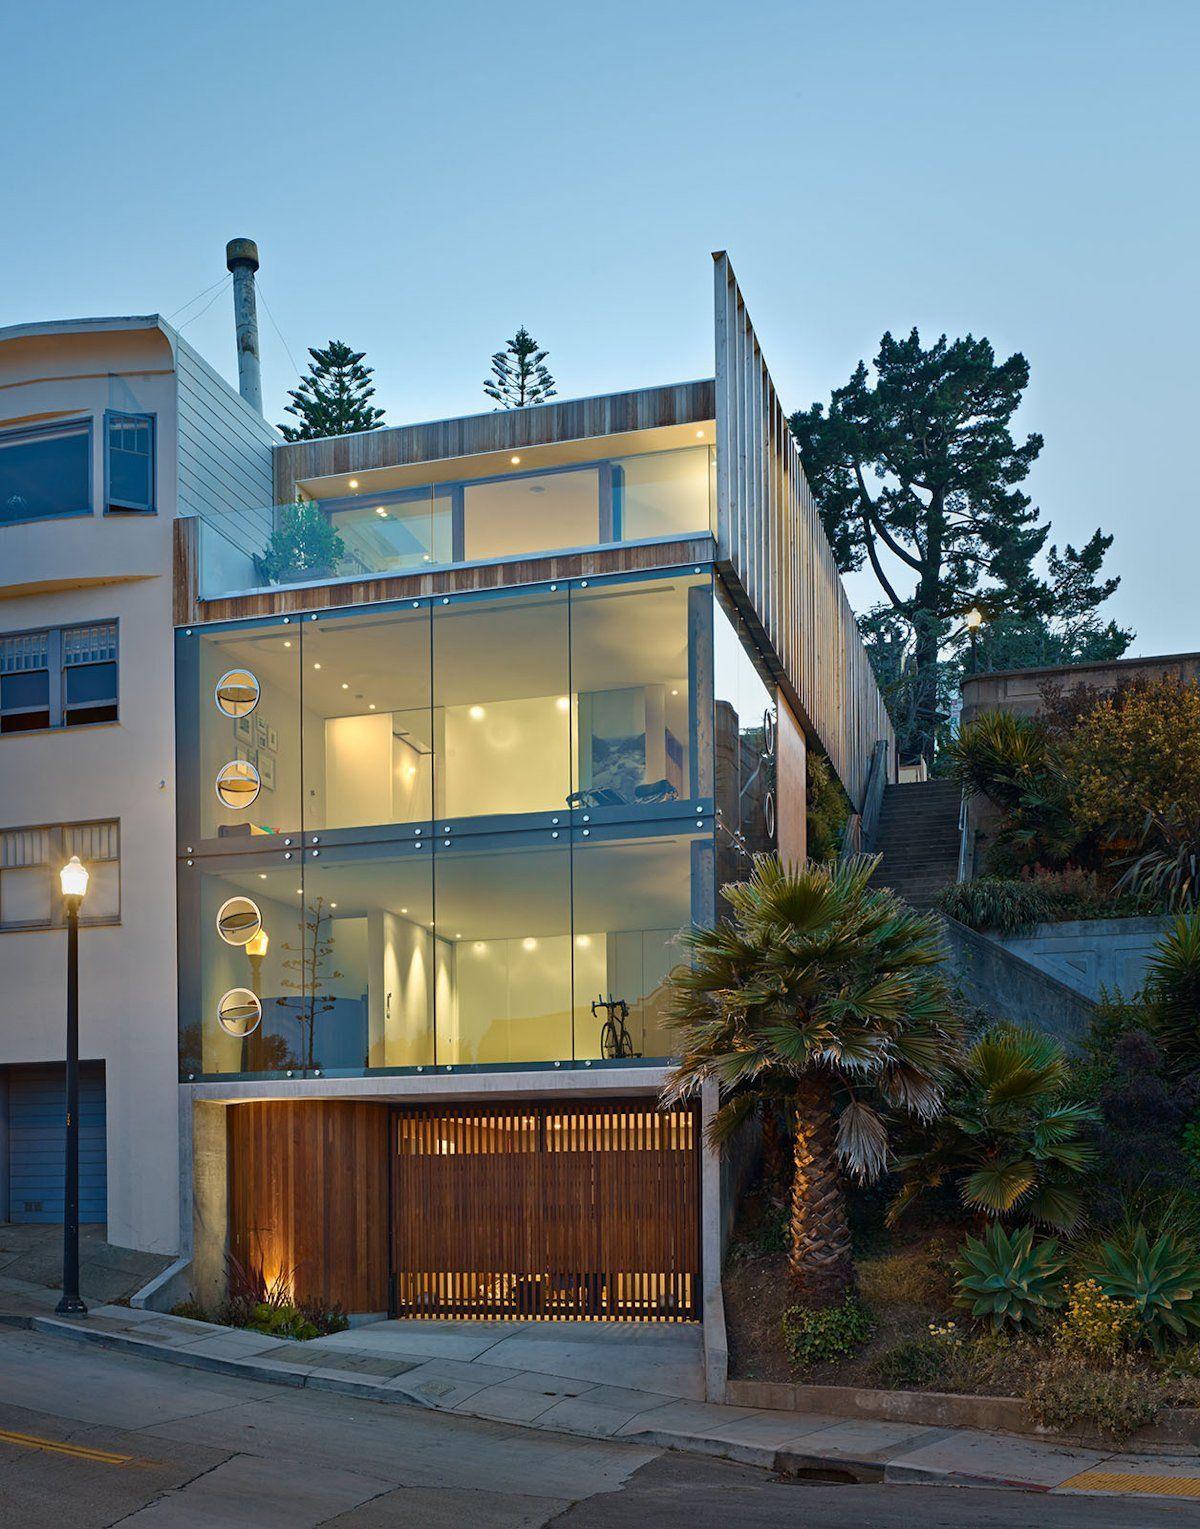 15 Contemporary Houses And Their Inspiring Garages Architecture Modern Architecture Contemporary House